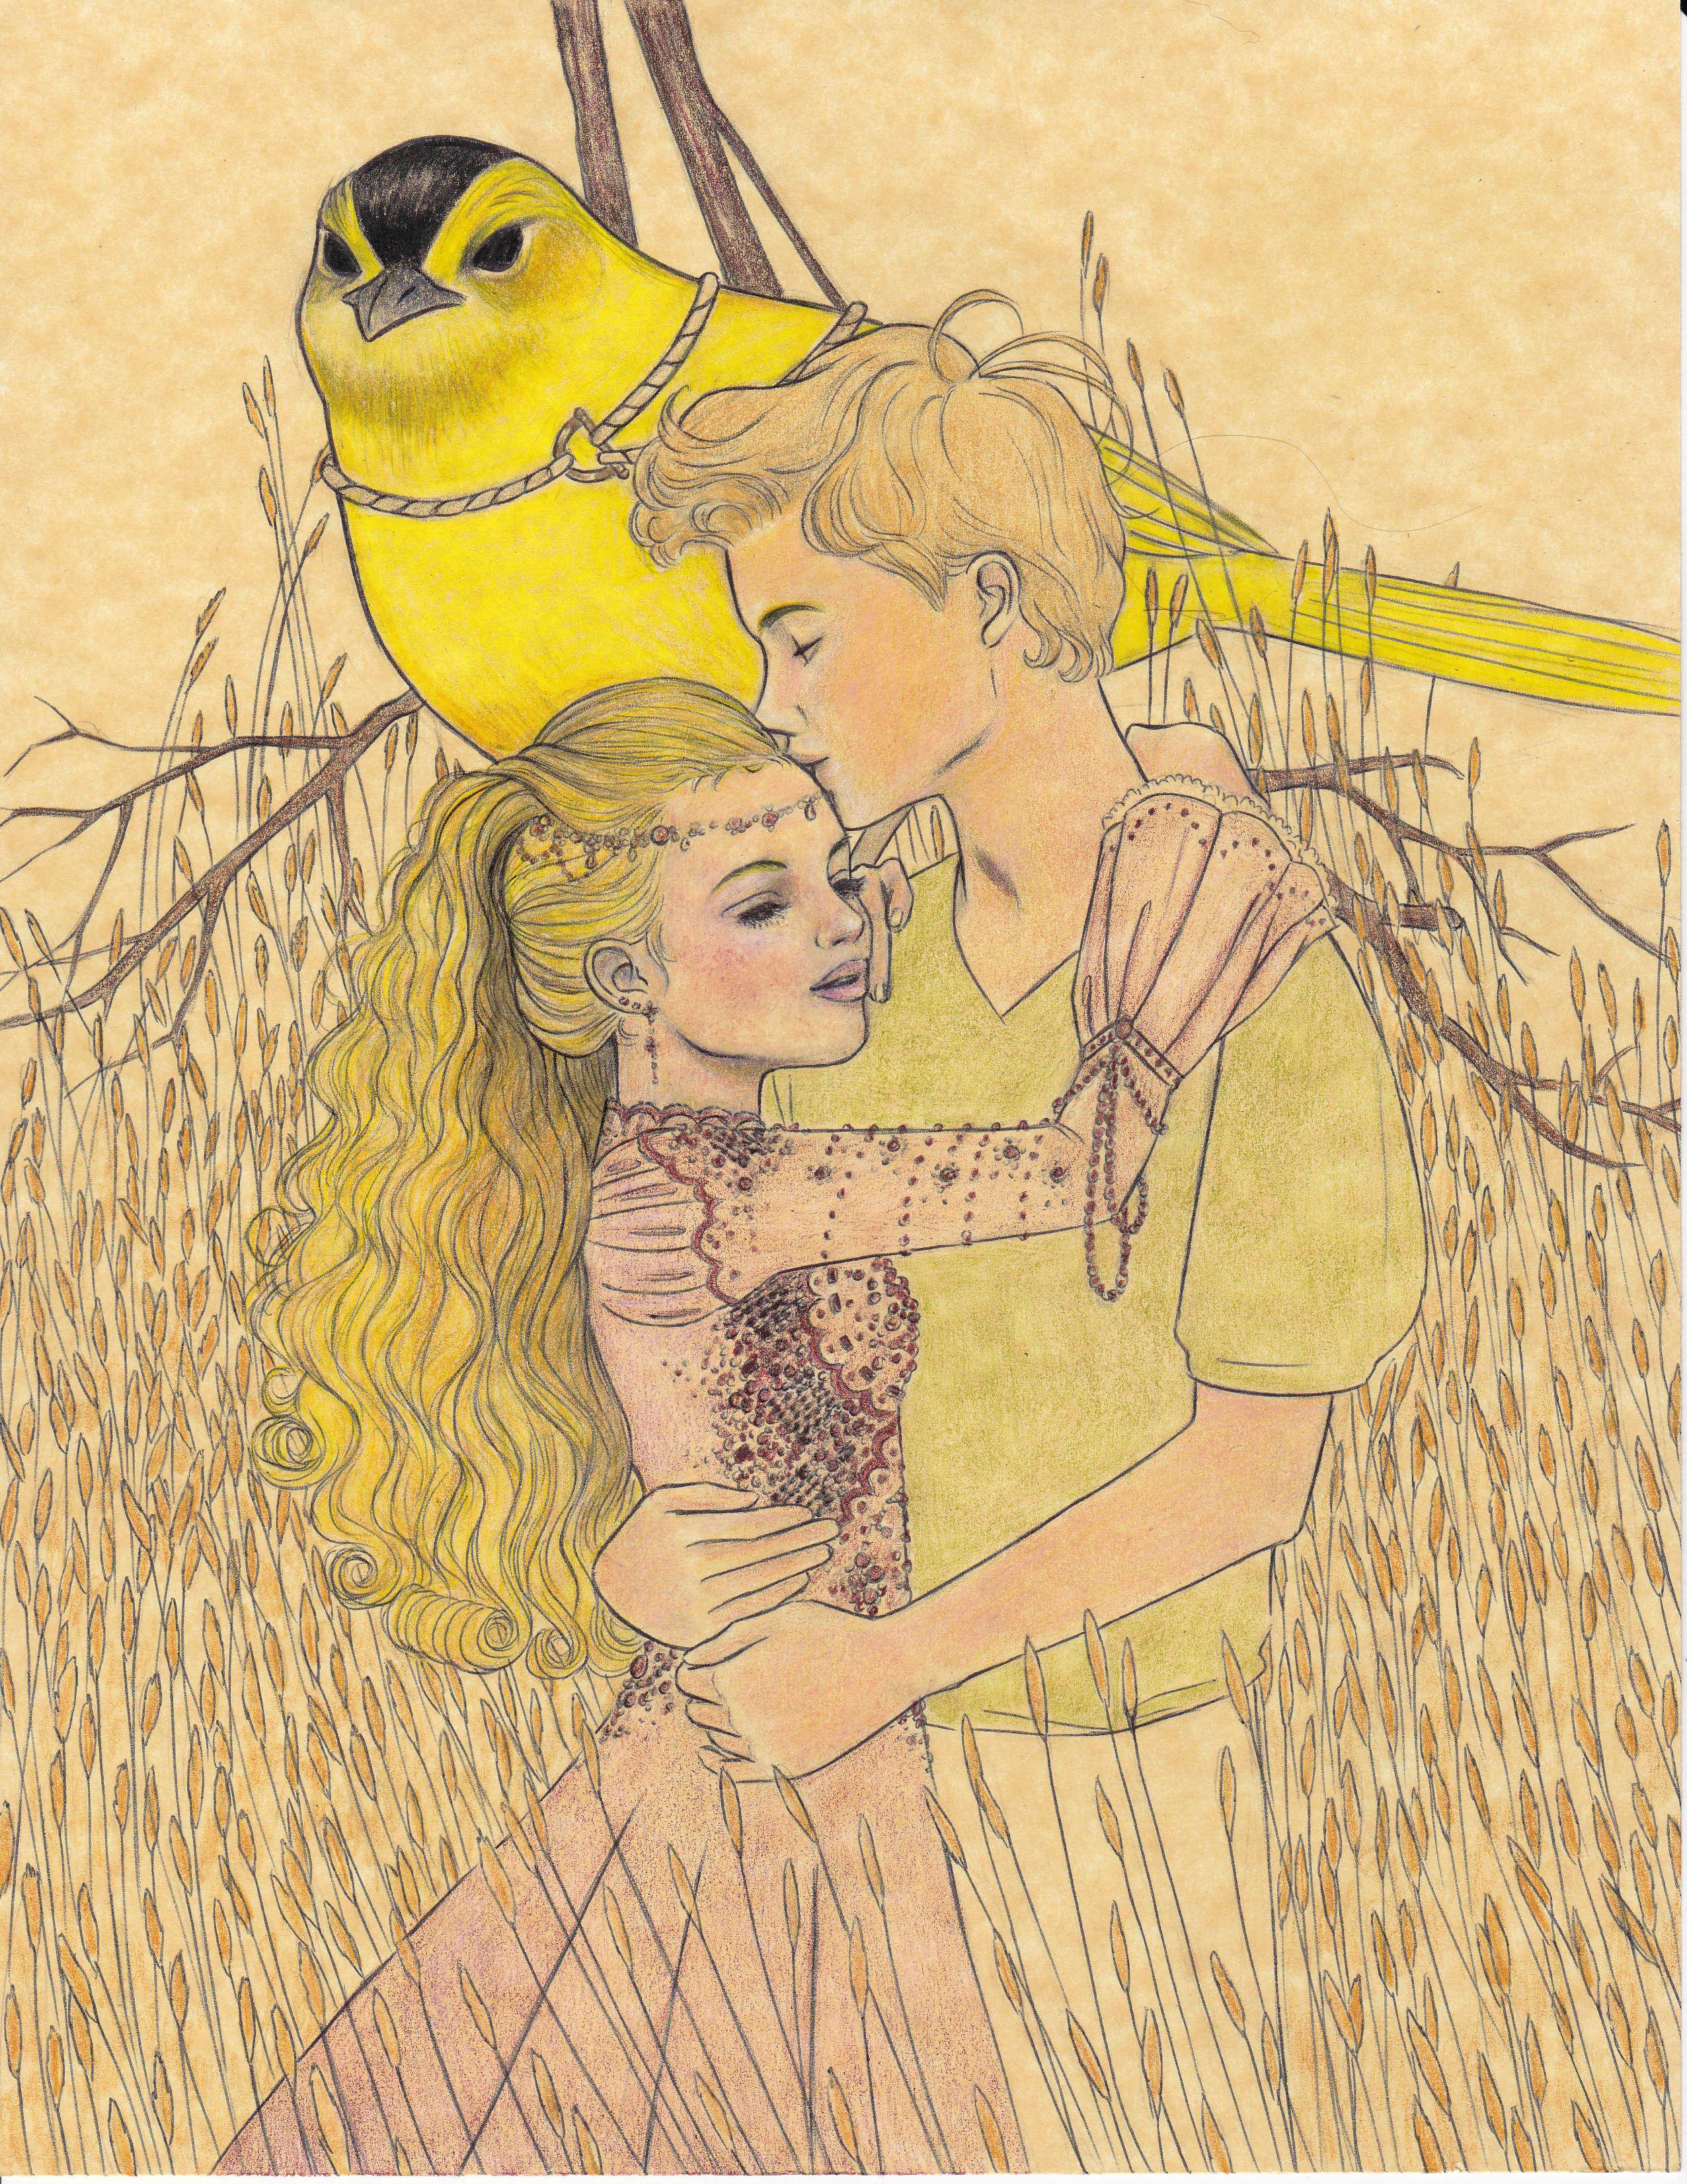 The Wheat Princess